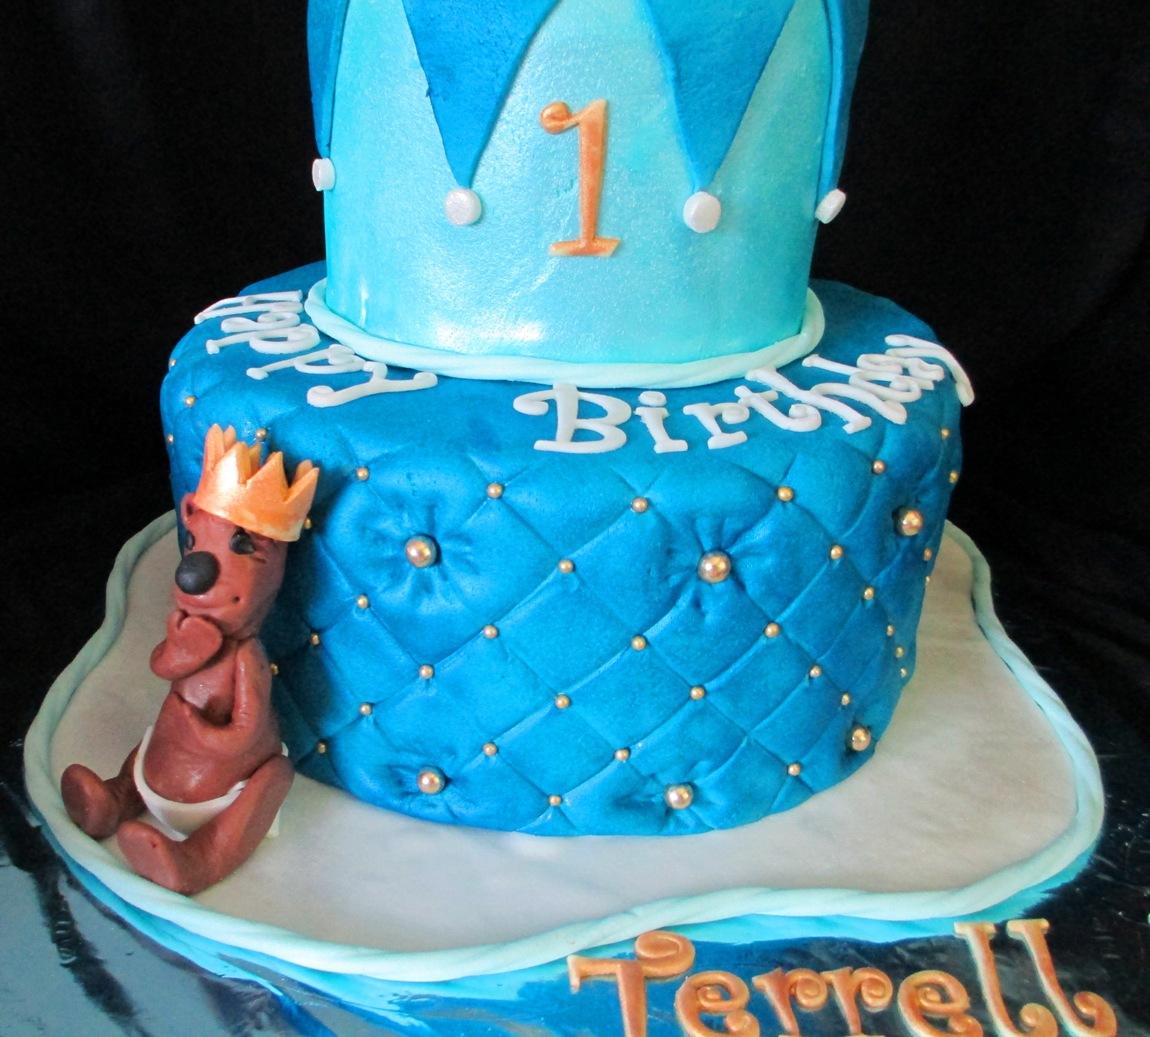 Birthday Cake Toddler Boy Image Inspiration of Cake and Birthday